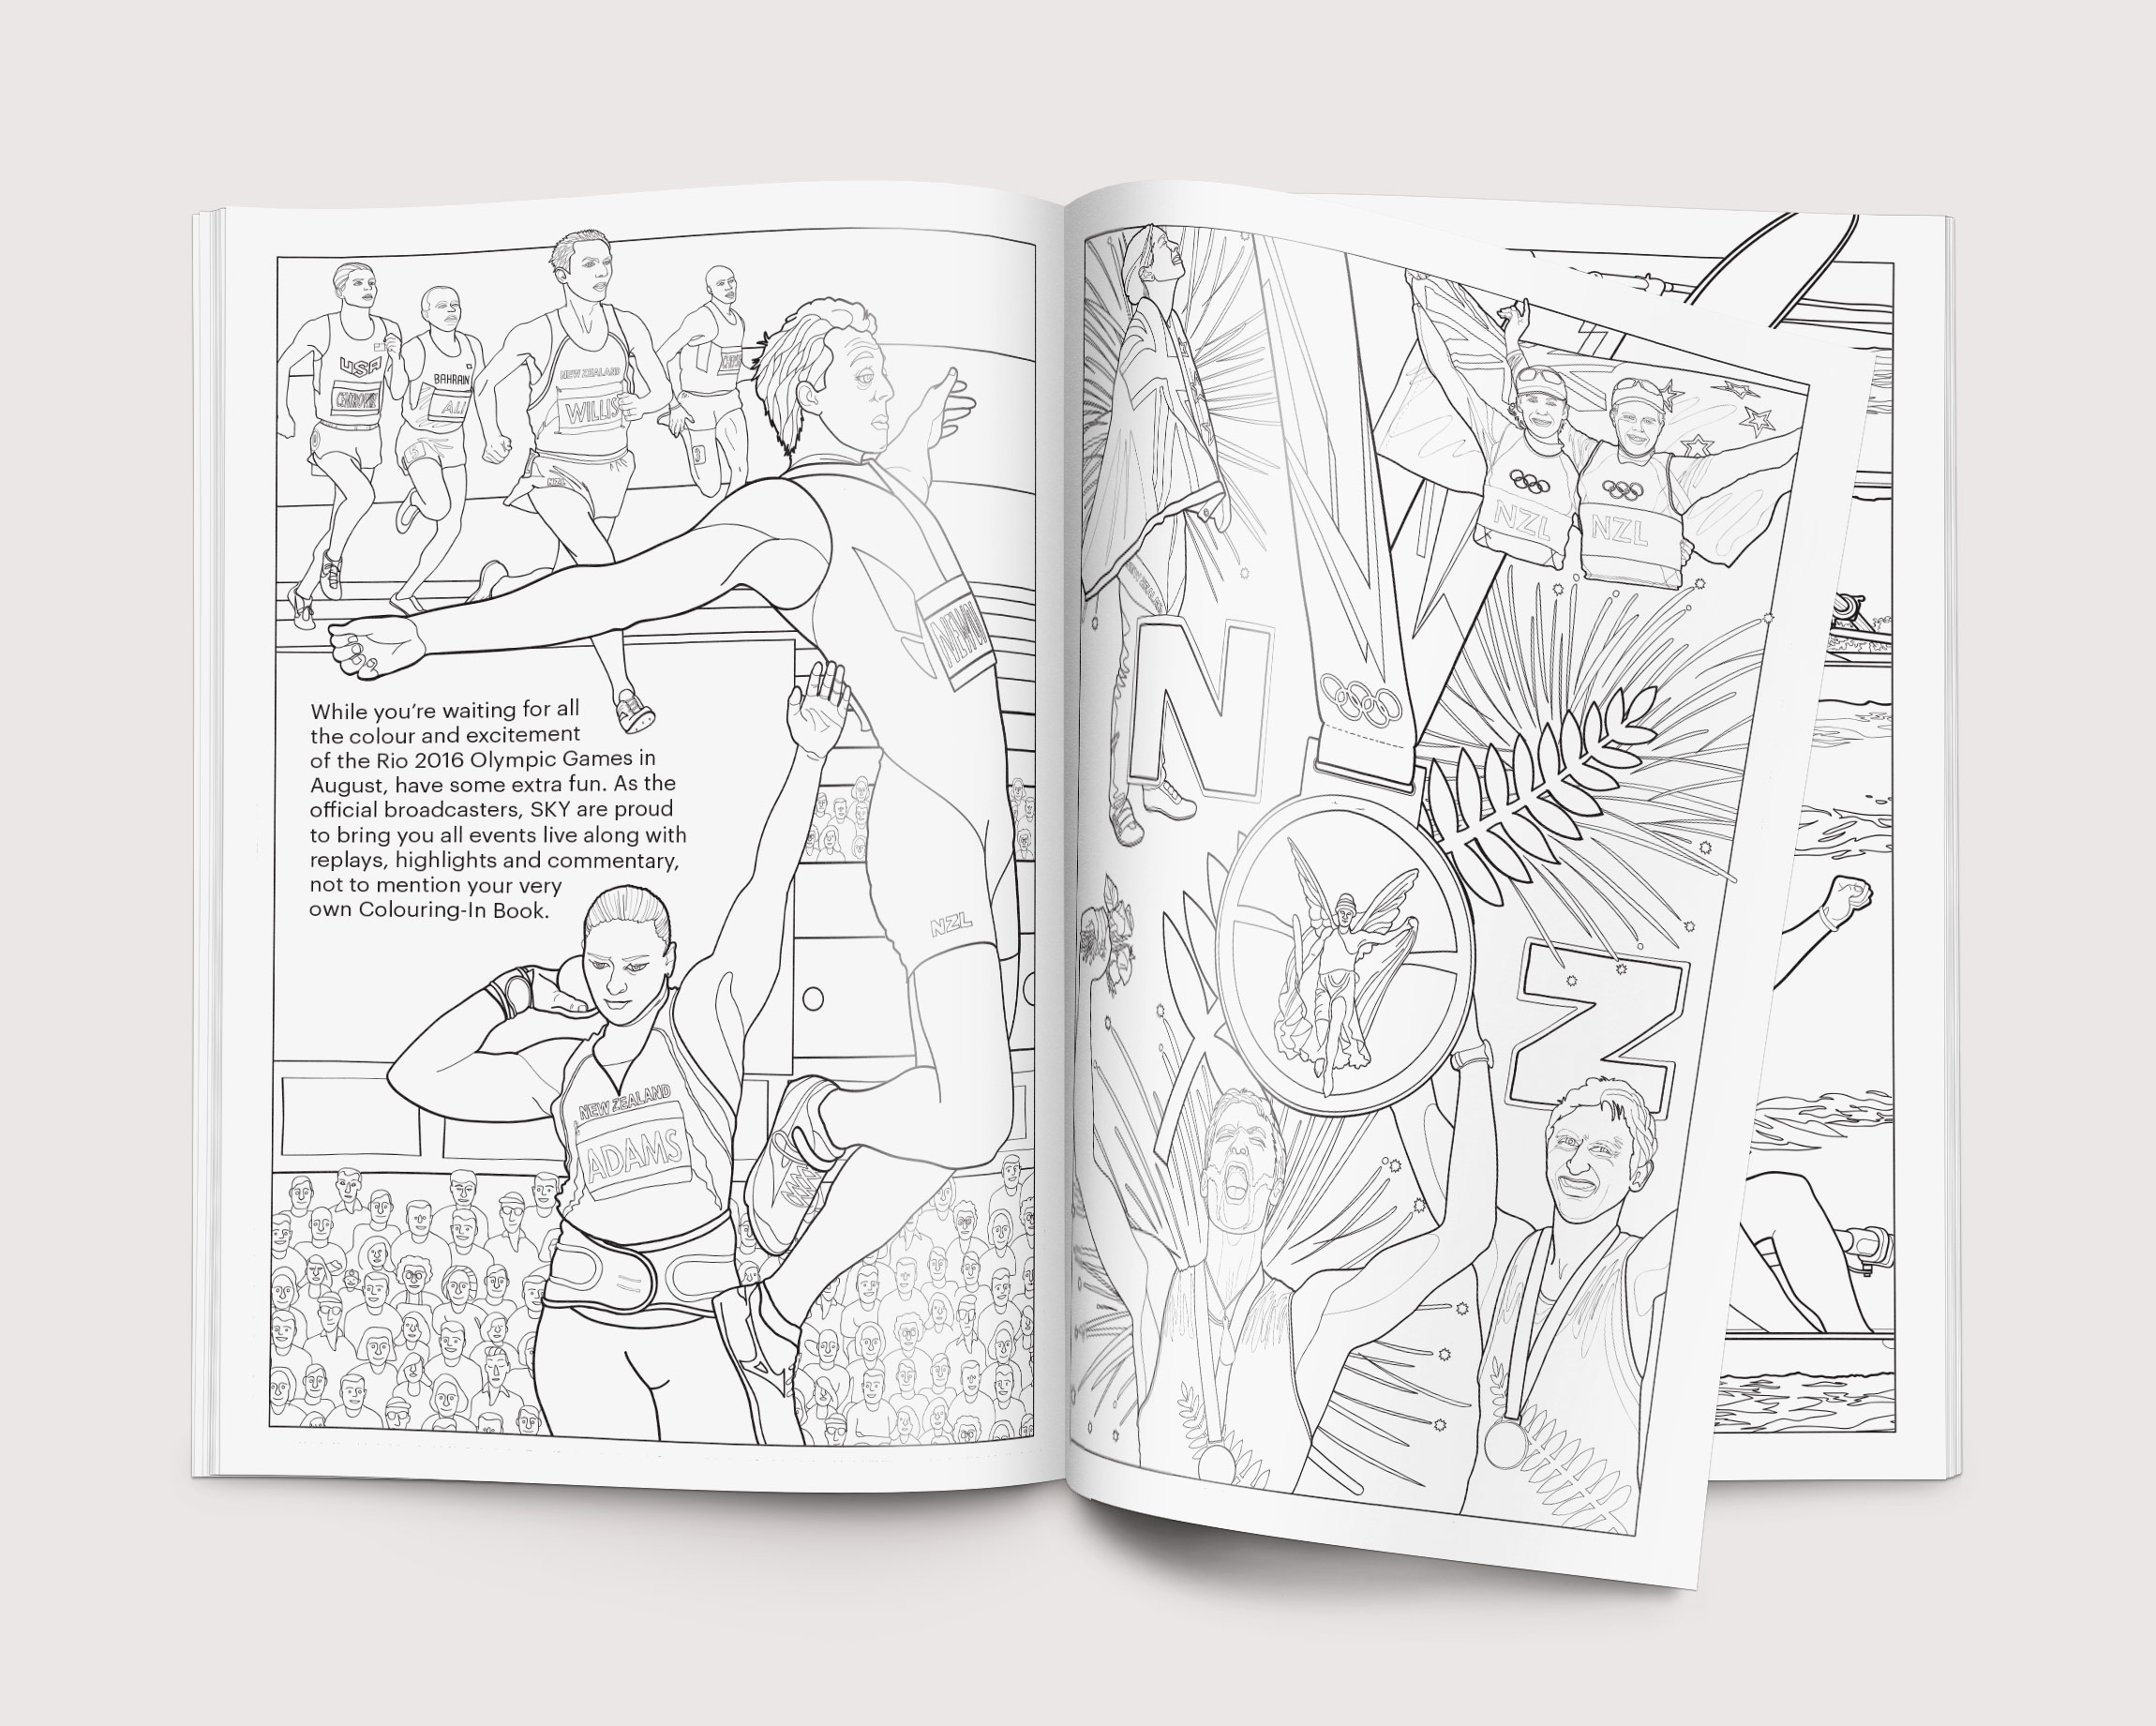 RIO Olympics 2016 broadcast sponsorship proposal brochure: art direction